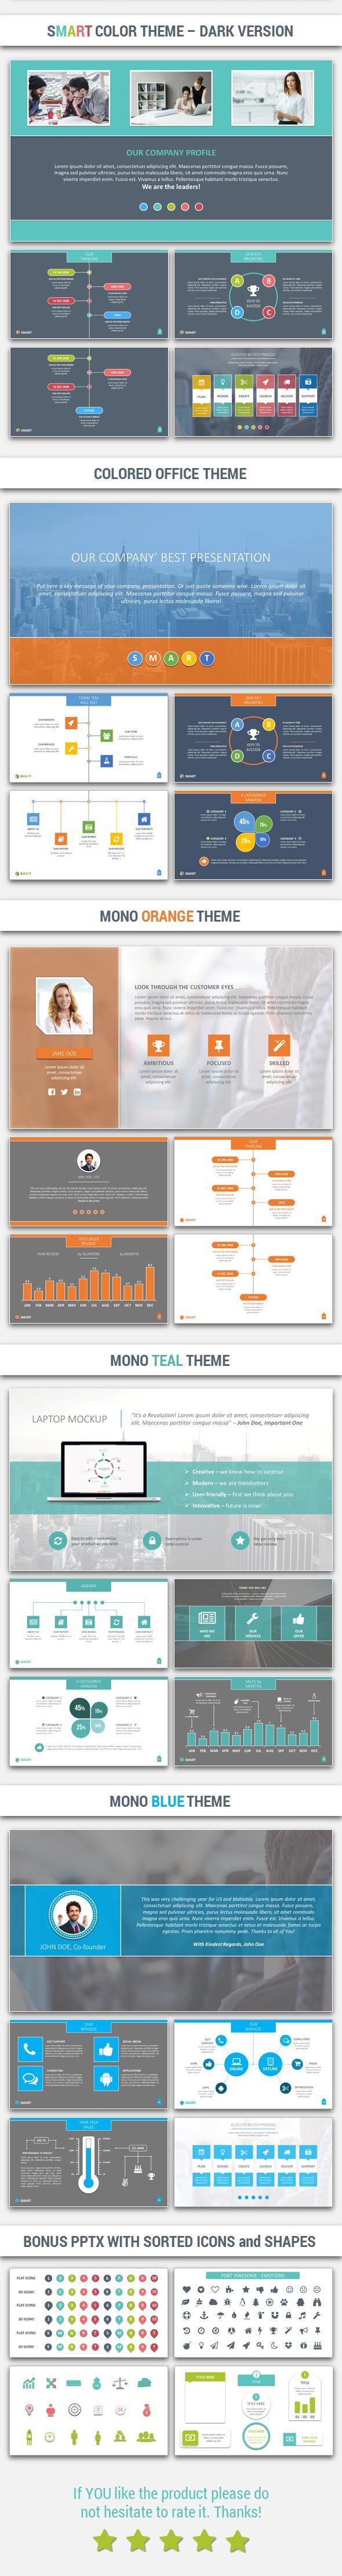 MULTIONE-100 – Multipurpose PowerPoint Template - 2